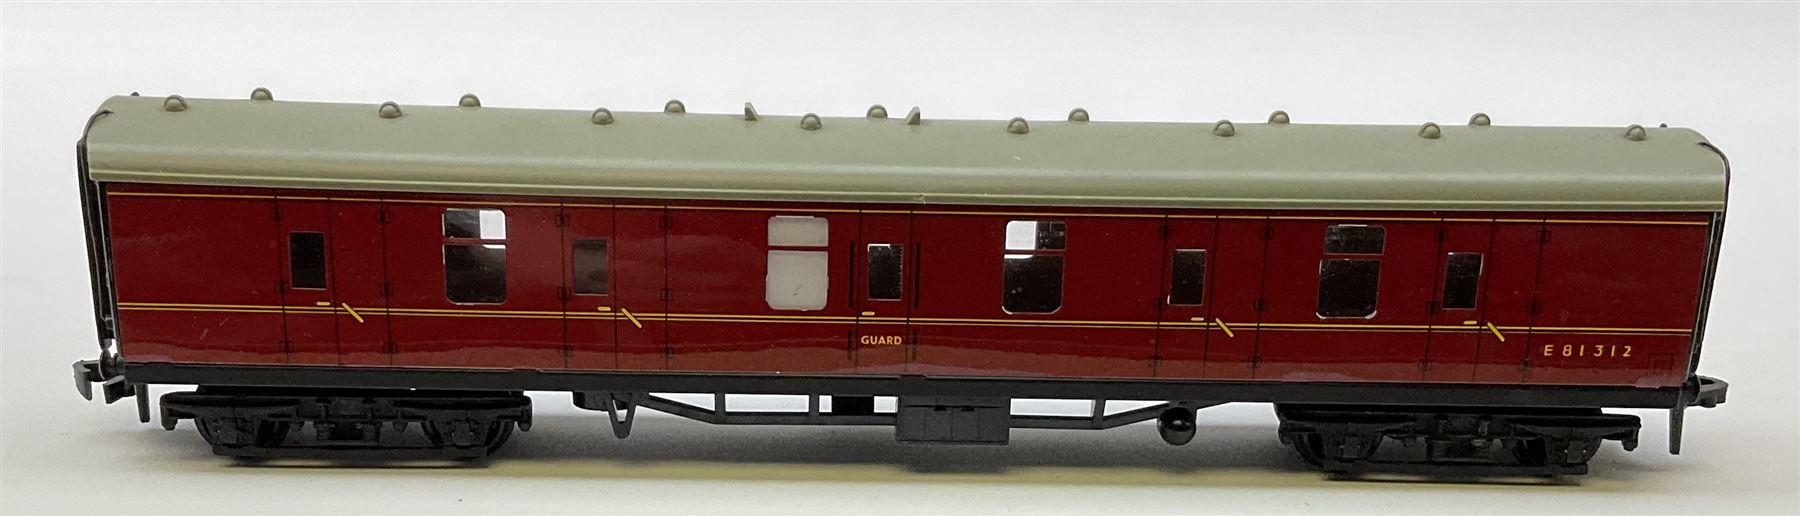 Hornby Dublo - 4075 Passenger Brake Van B.R.; 4078 Composite Sleeping Car B.R.; 4082 Suburban Coach - Image 5 of 5